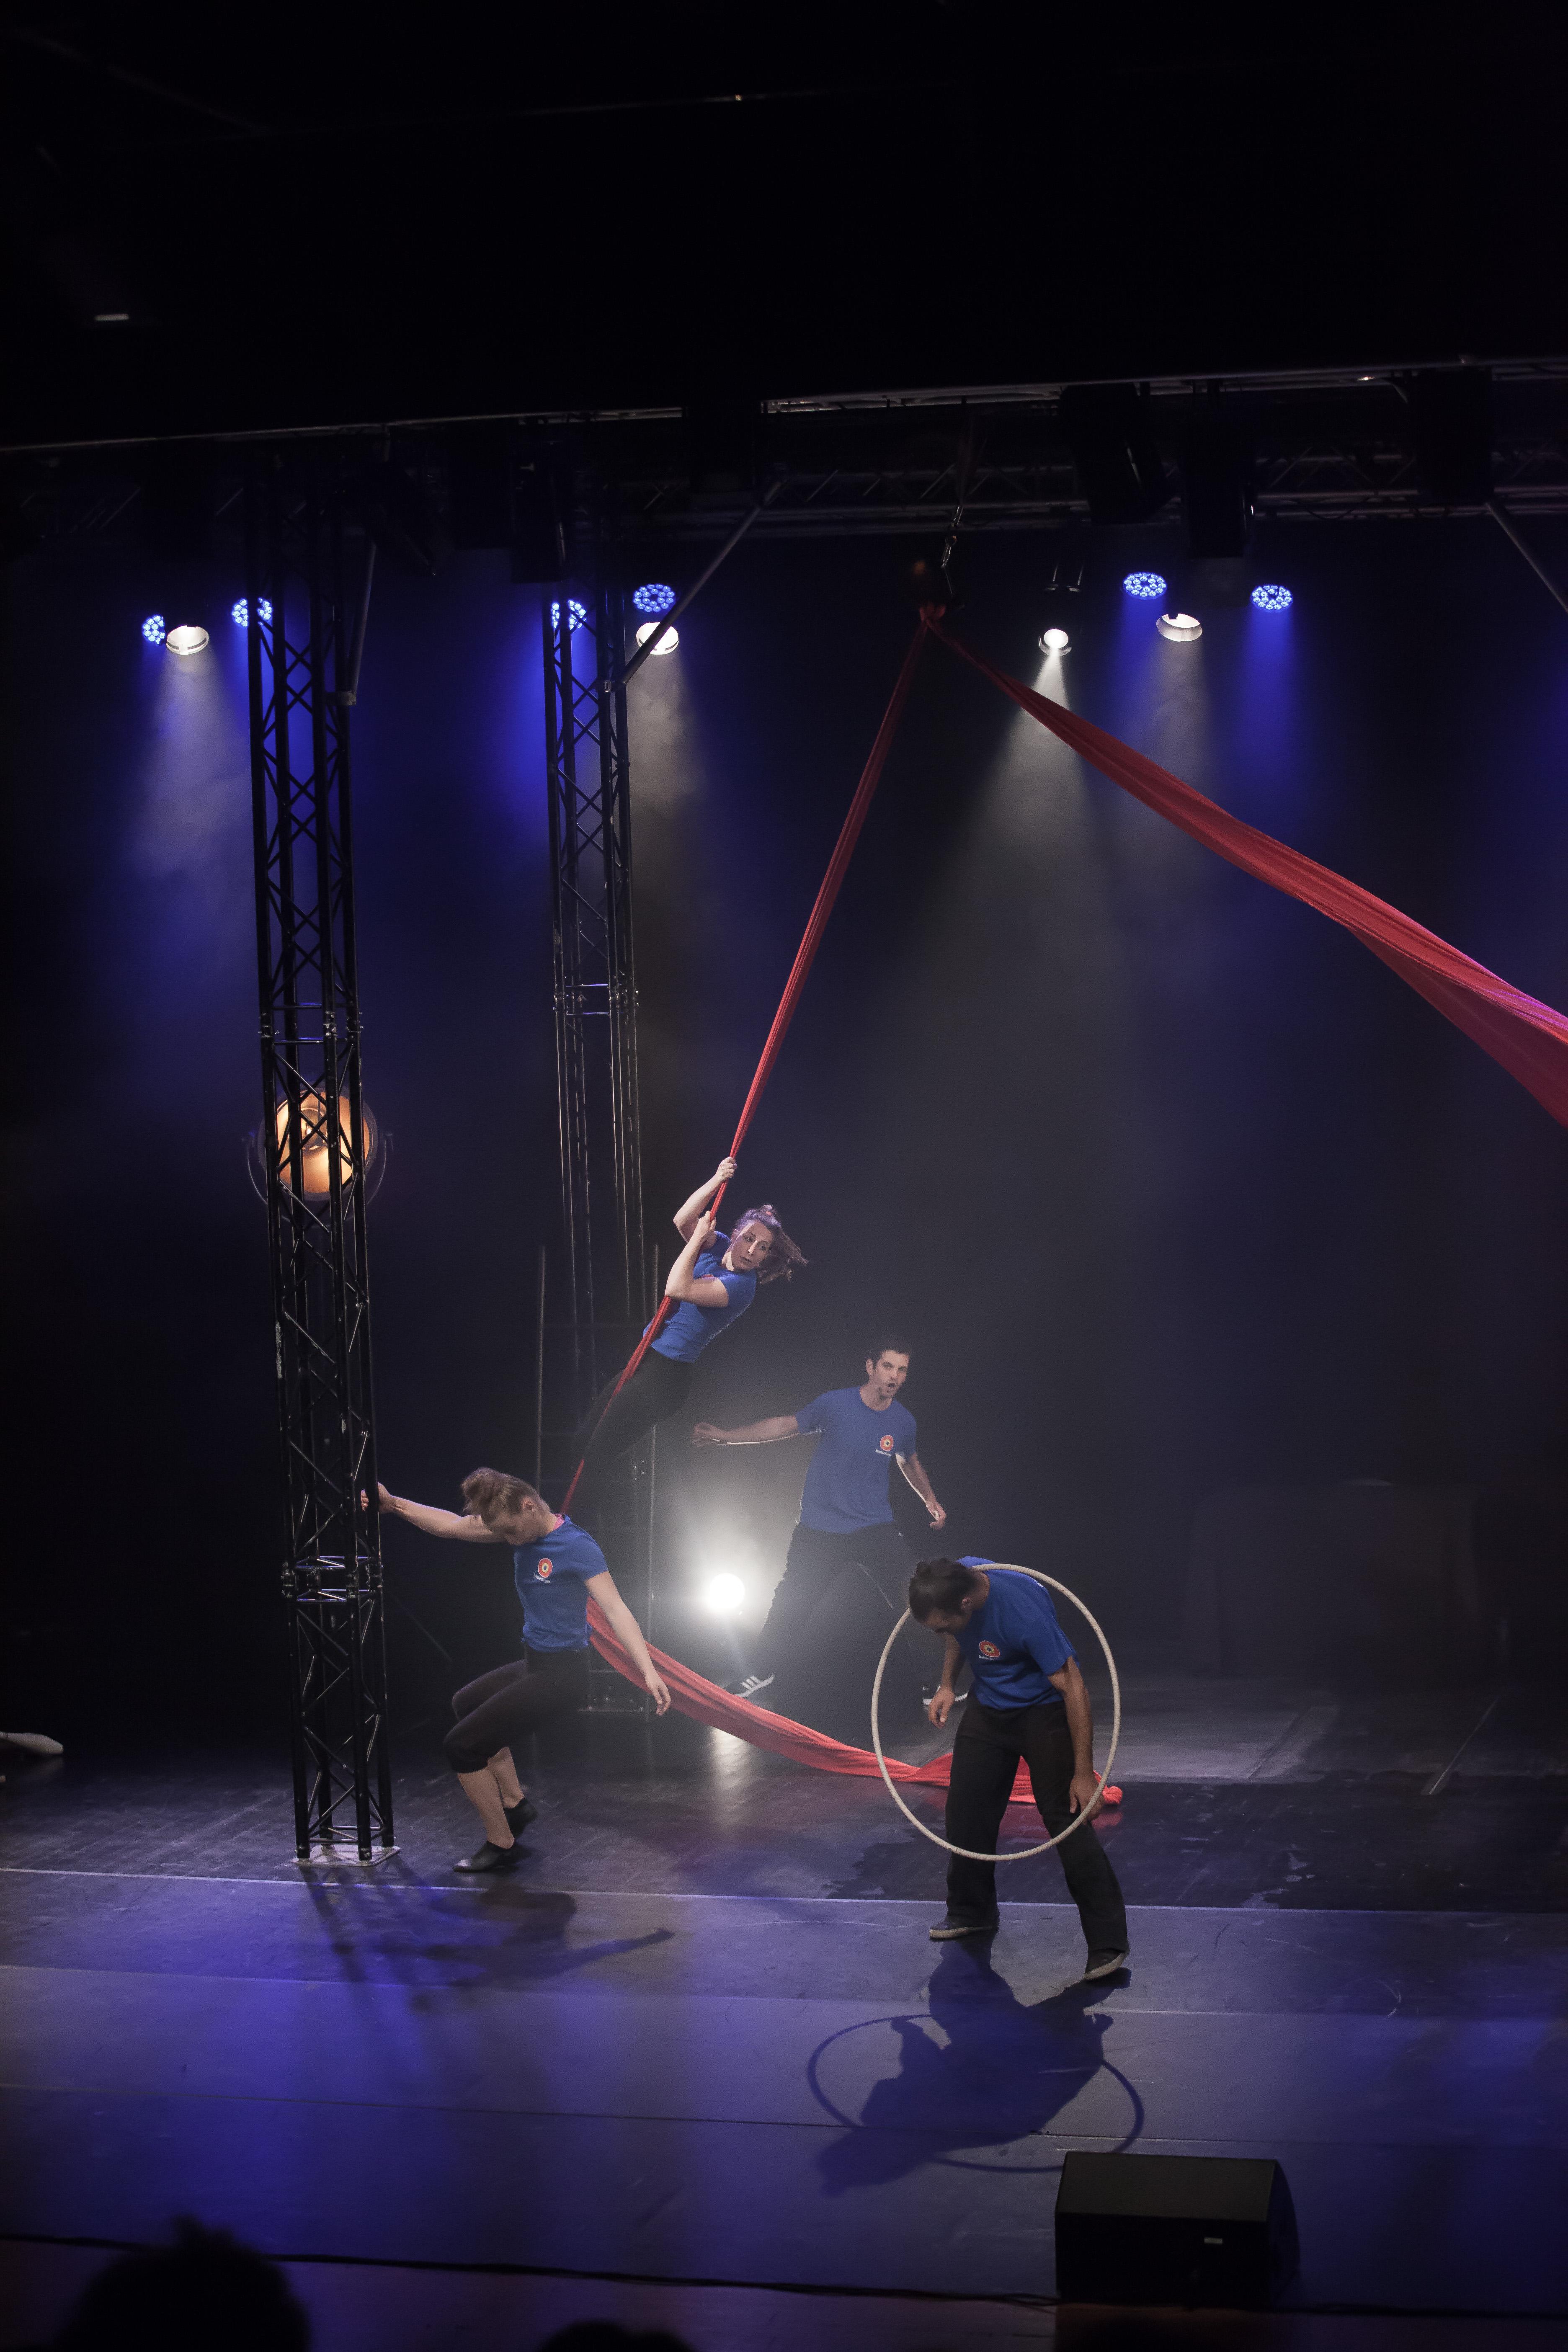 170701-battle-cirque-jdufresne-34_35834322325_o